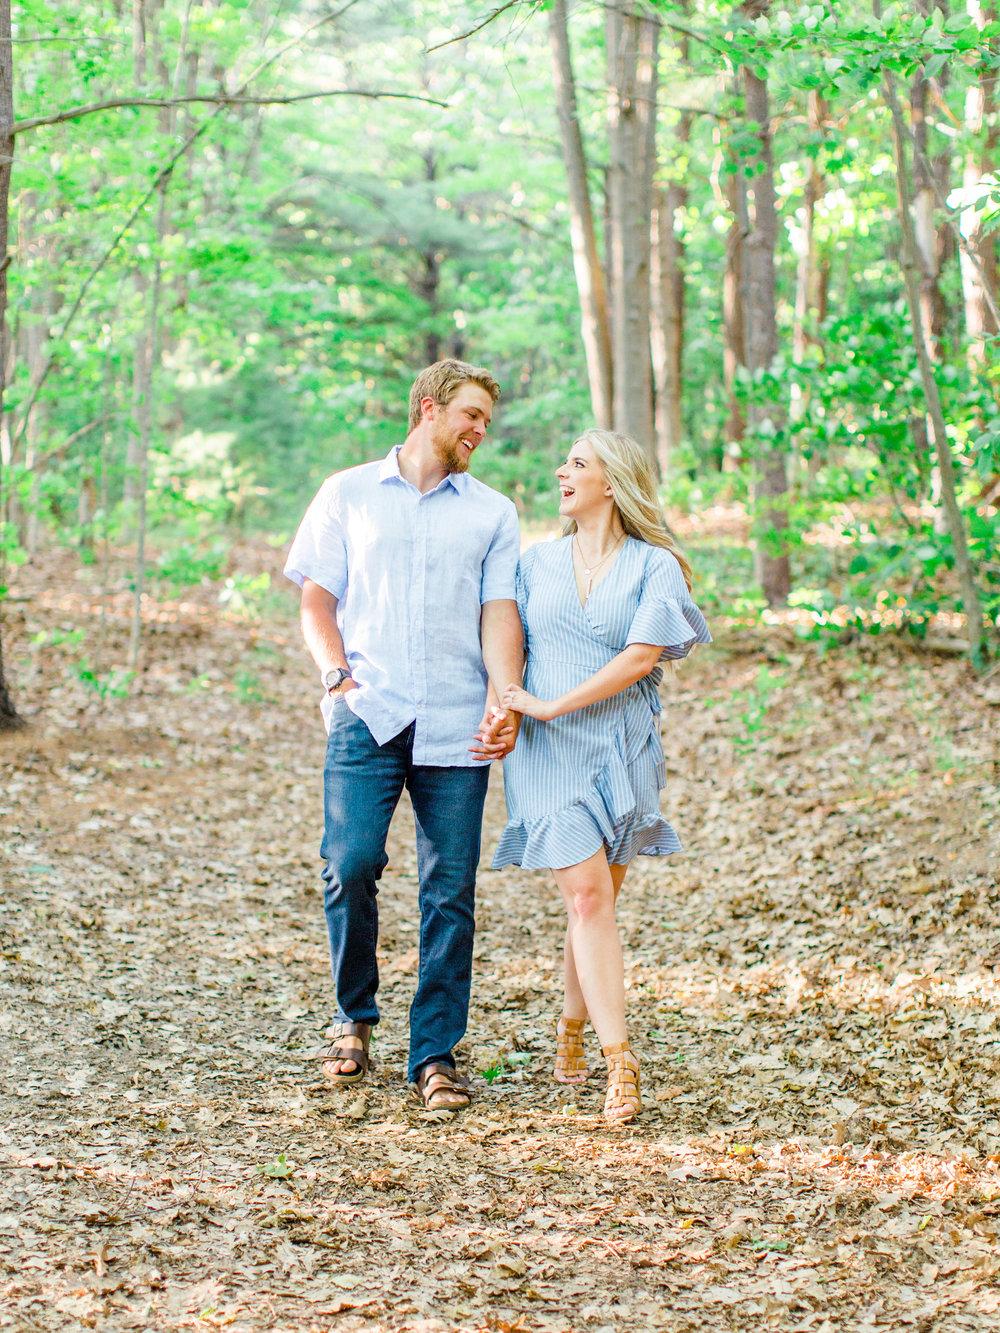 Hannah+Kyle+Engaged-39.jpg